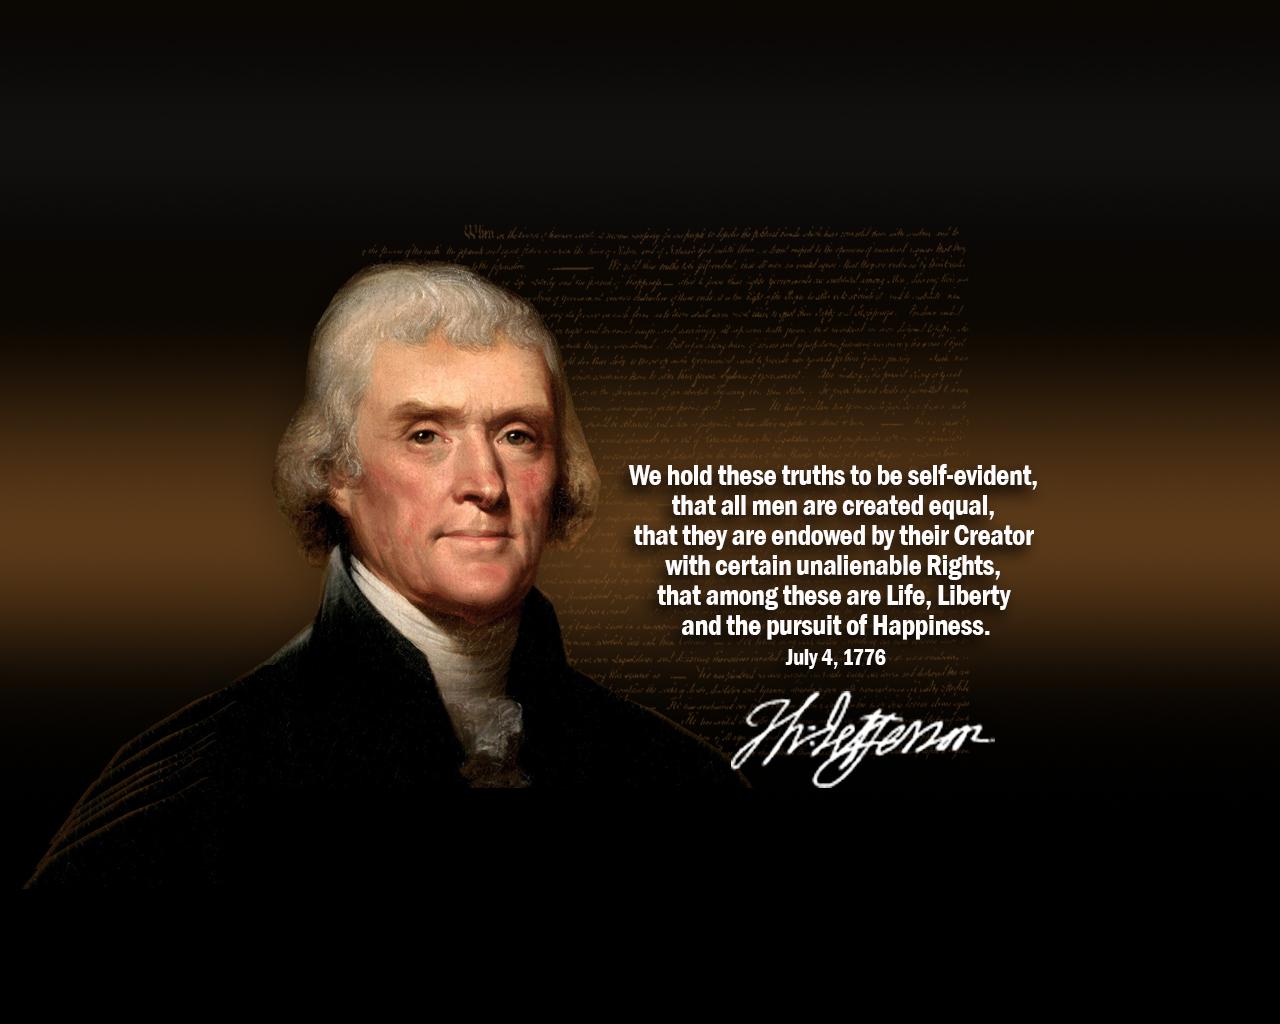 jefferson quote declaration wallpaperjpg 1280x1024